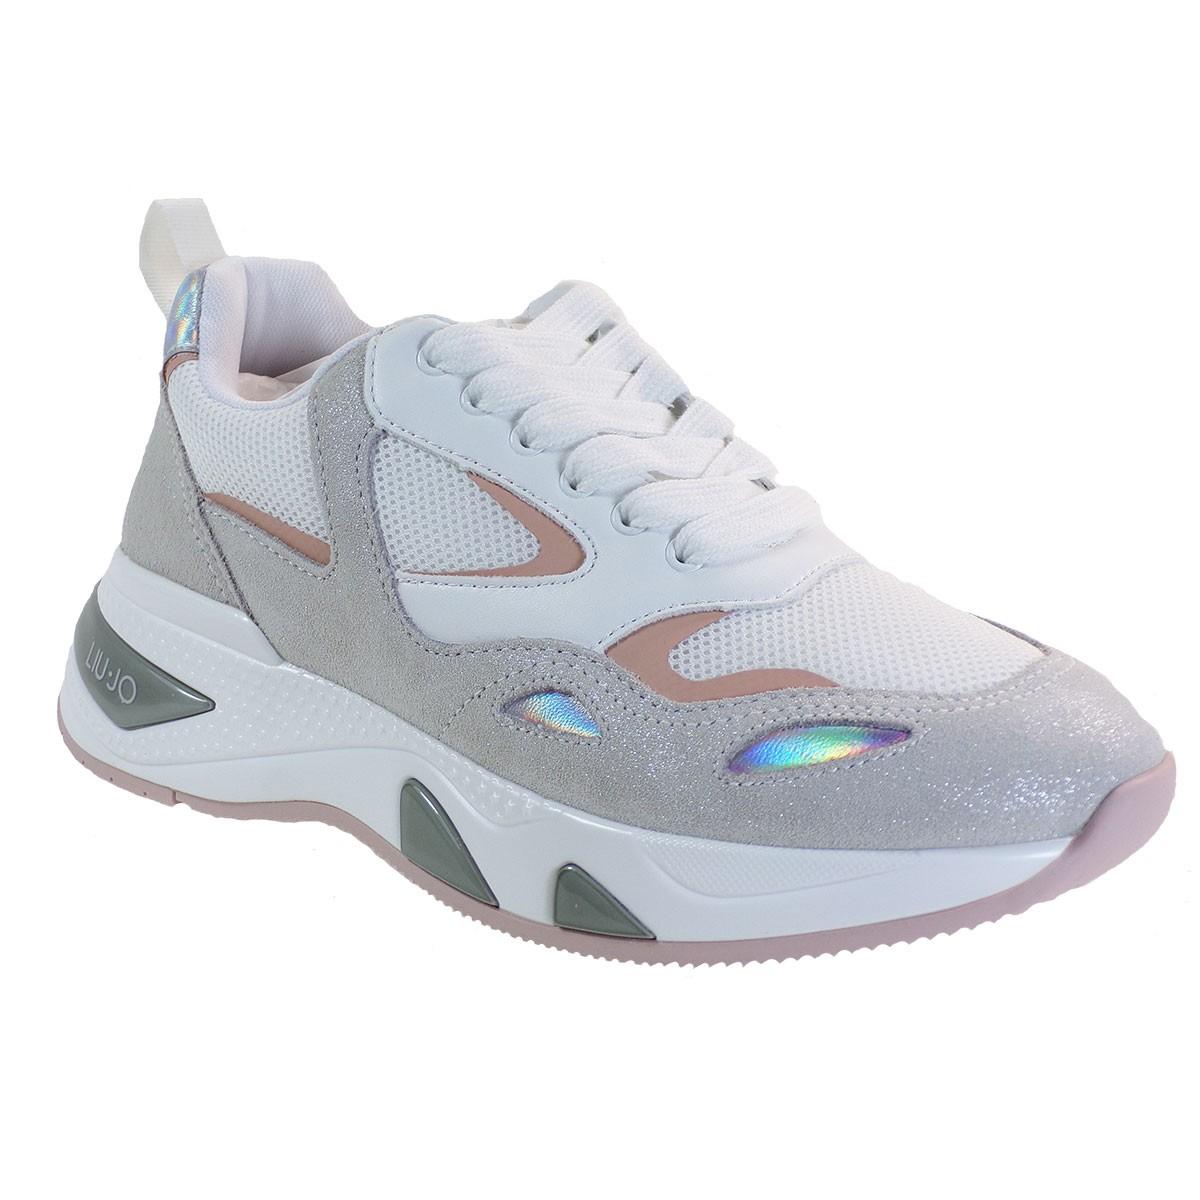 Liu-Jo Sneakers Παπούτσια Γυναικεία HOA-1 BA1035 Λευκό